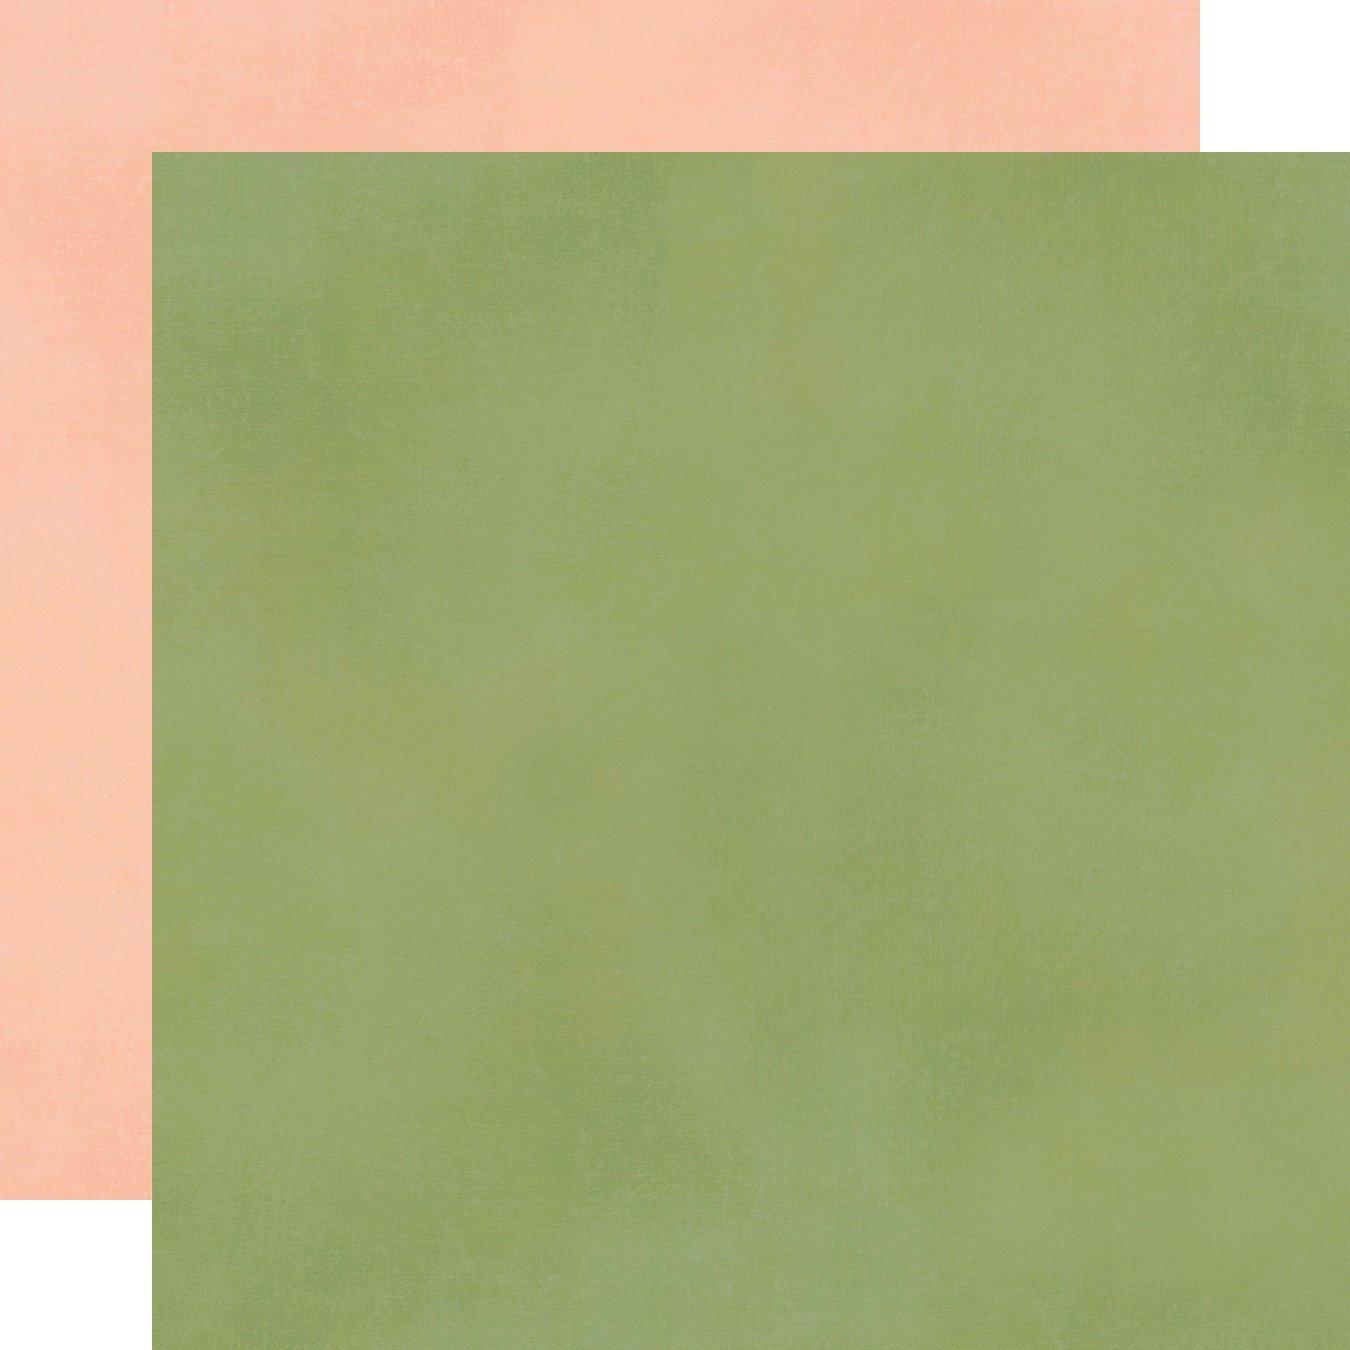 SPRING FARMHOUSE - BLUSH/GREEN